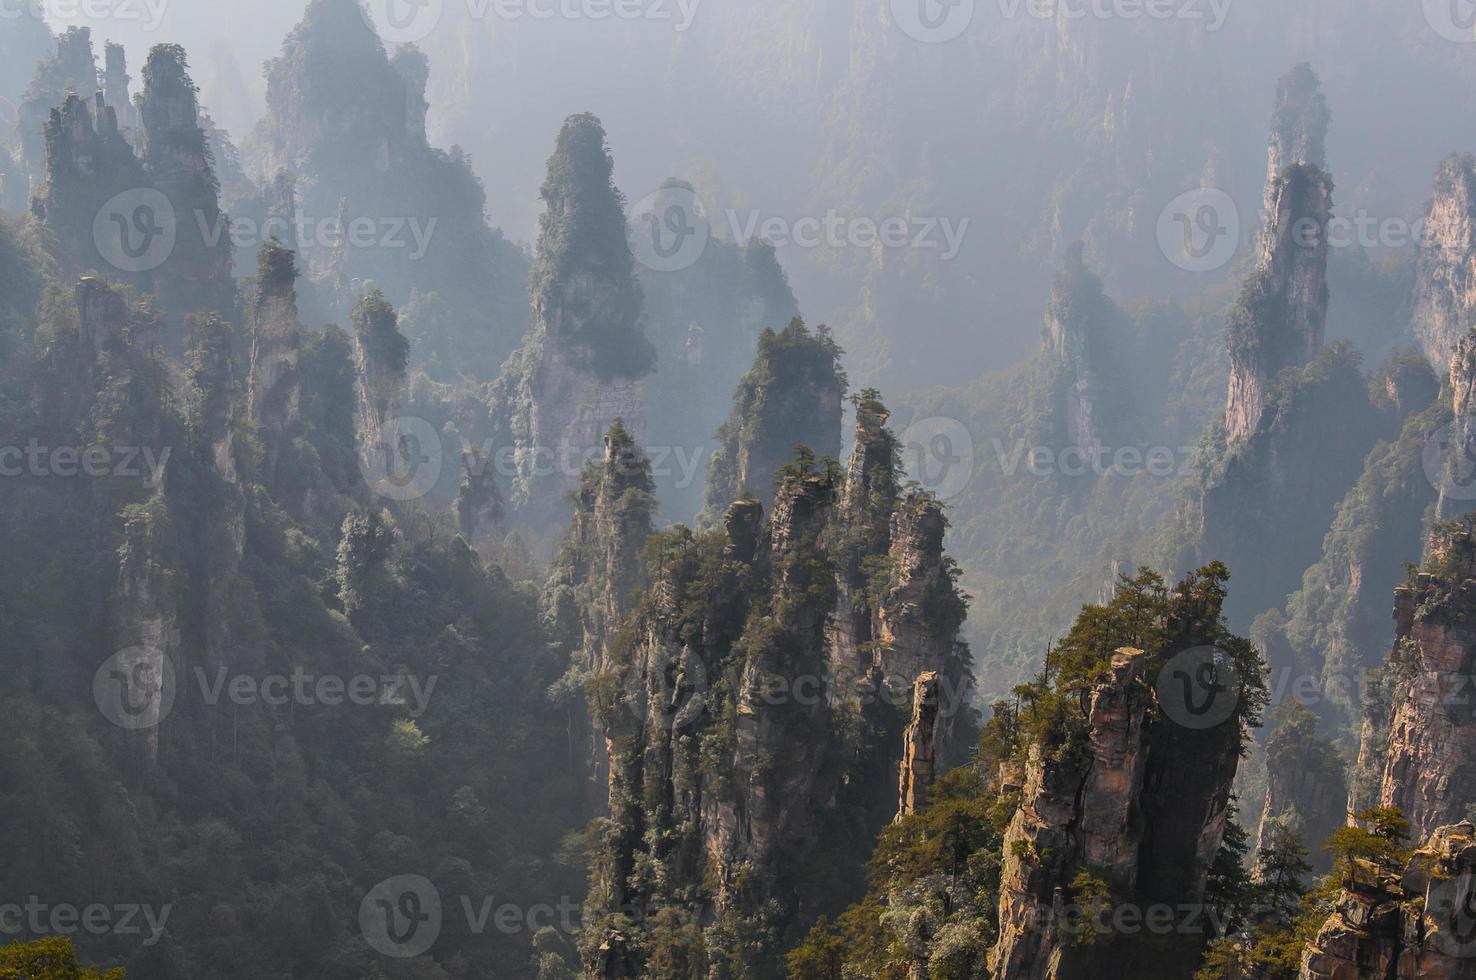 zhangjiajie nationella geologiska skogspark foto